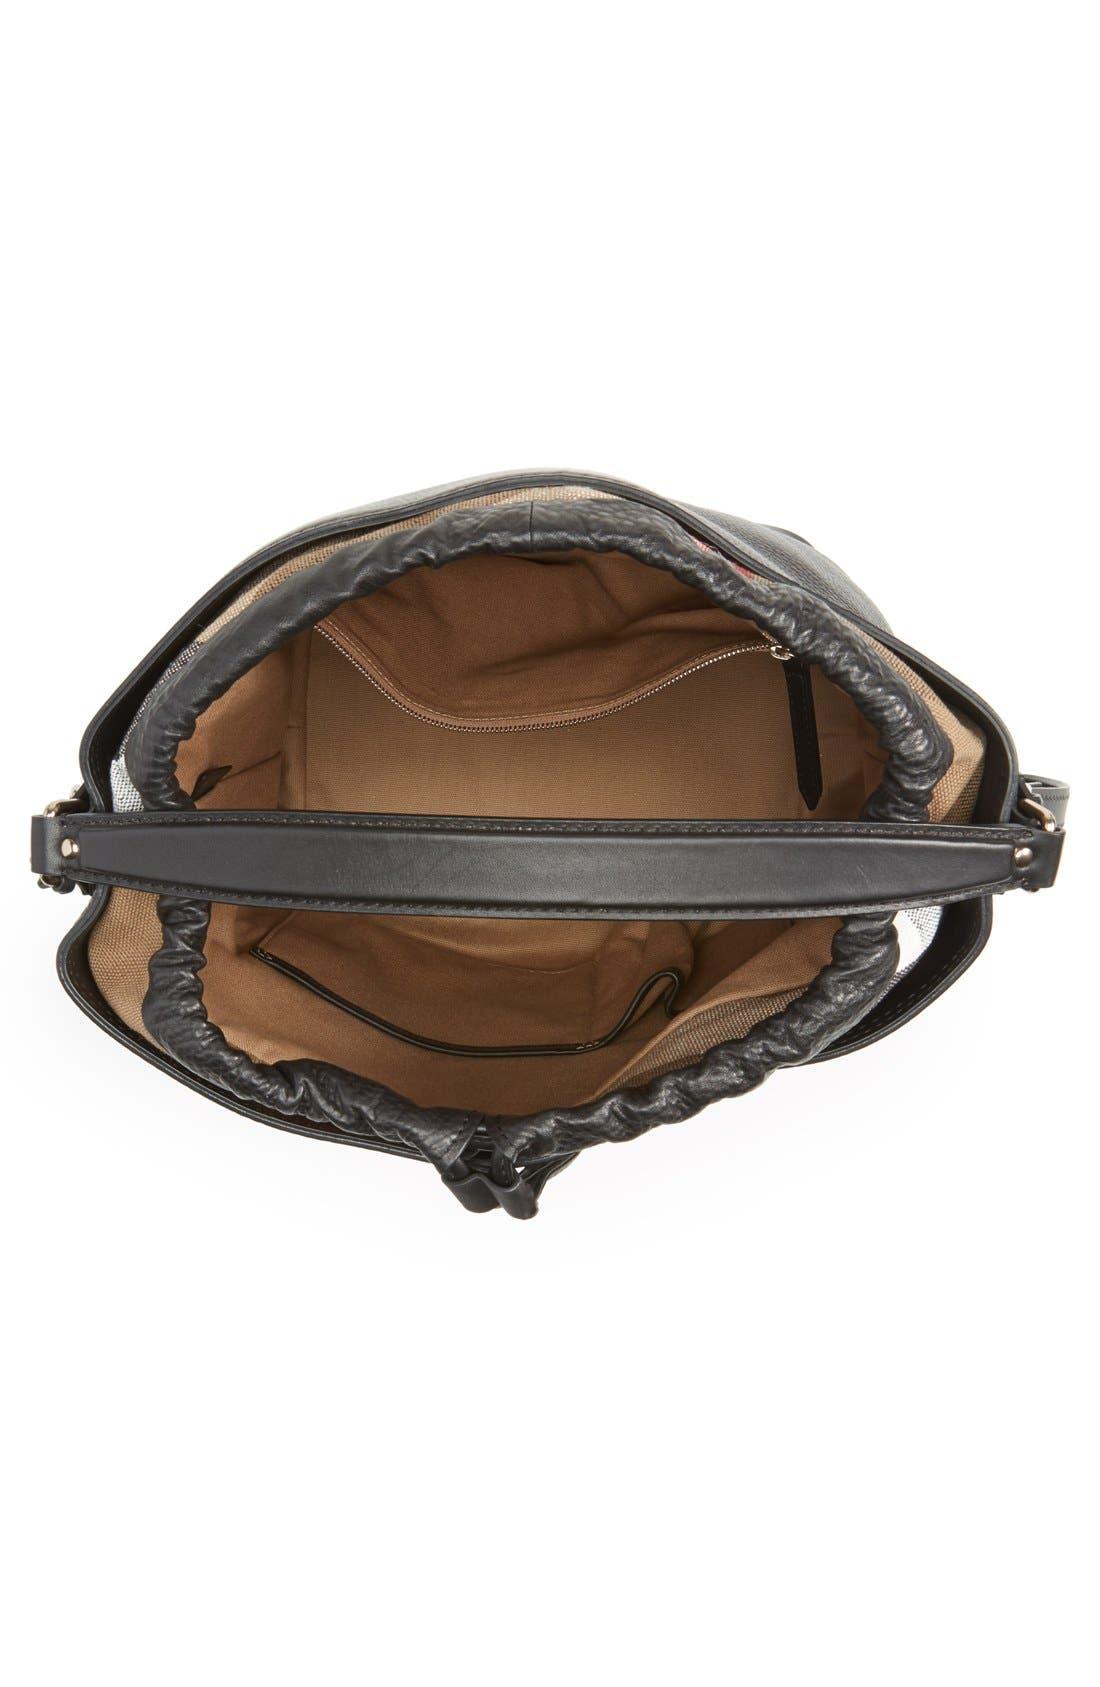 Brit 'Medium Susanna' Leather & Canvas Check Hobo Bag,                             Alternate thumbnail 4, color,                             001